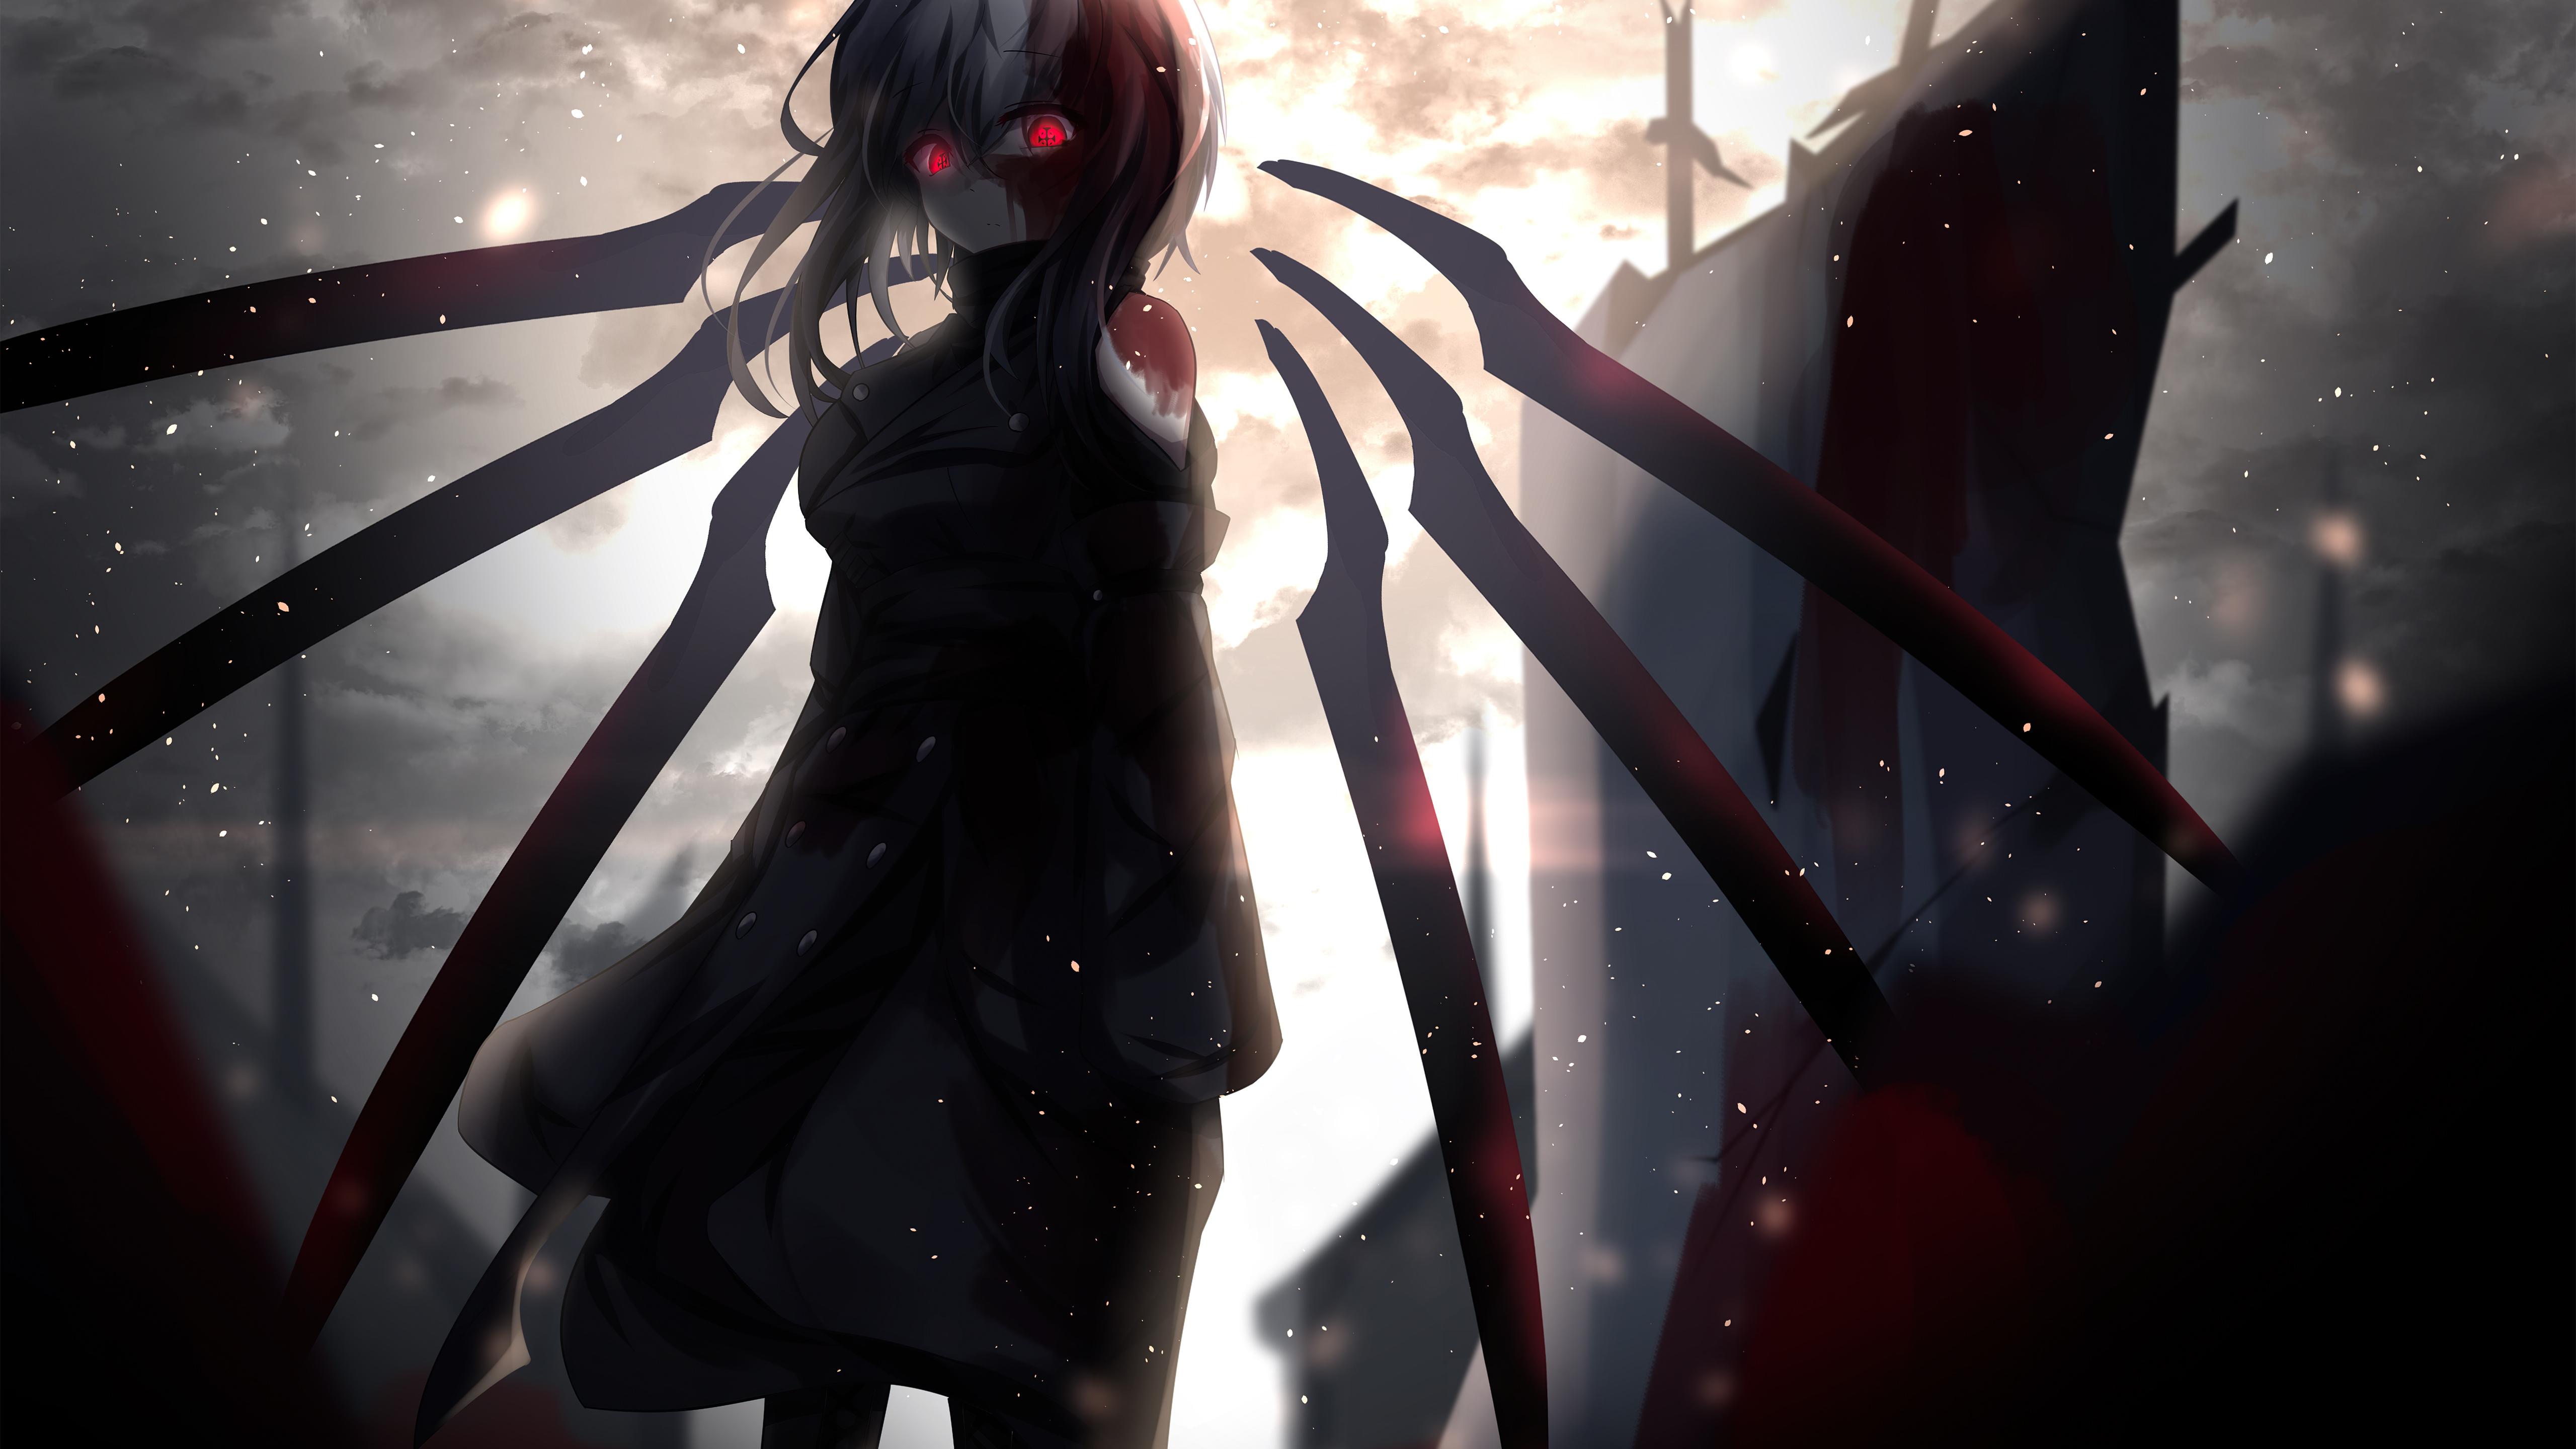 red-glowing-eyes-anime-girl-5k-z6.jpg